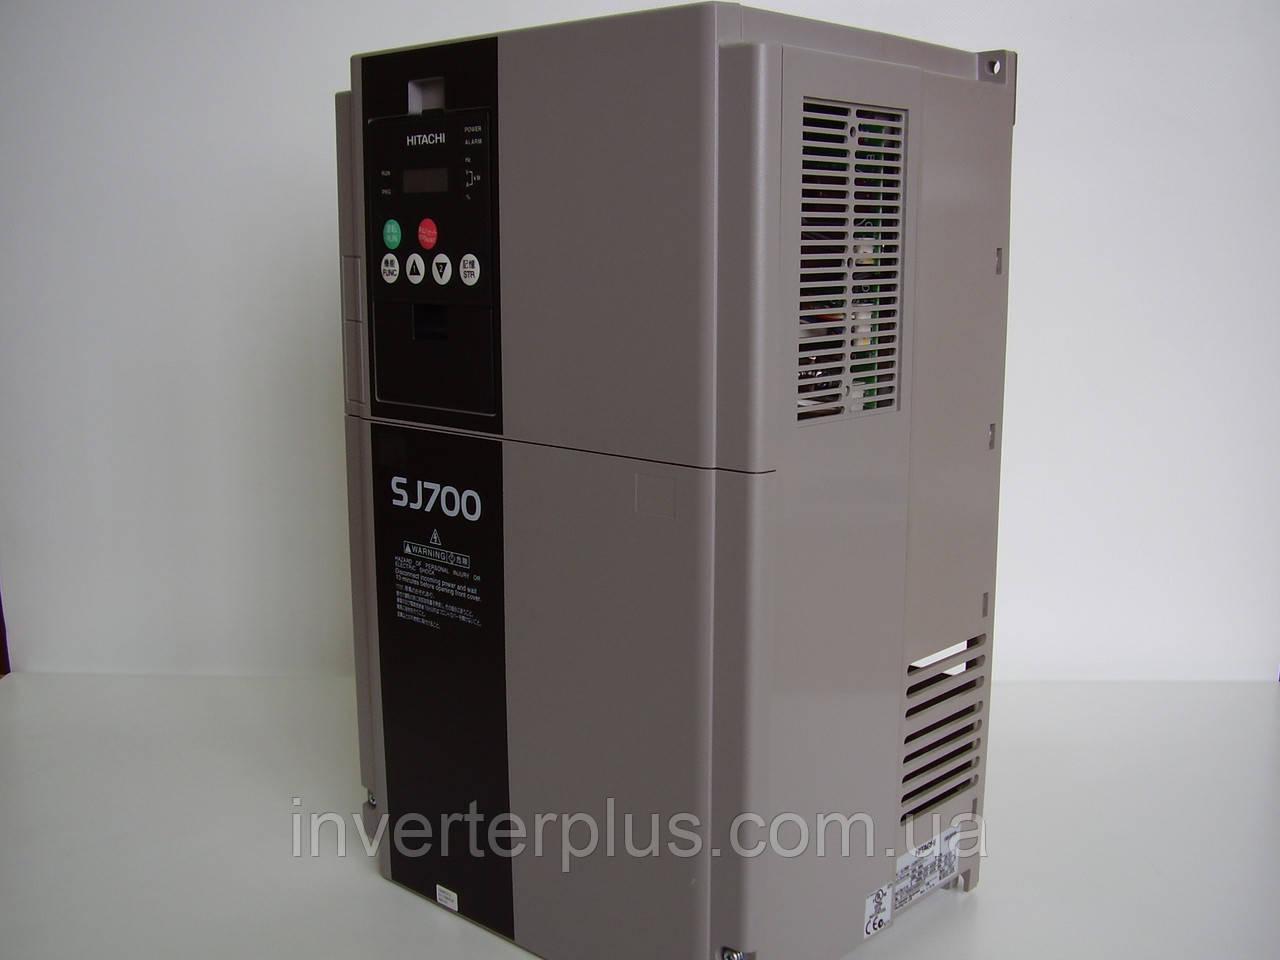 SJ700D-300HFEF3, 30кВт/380В. Інвертор Hitachi